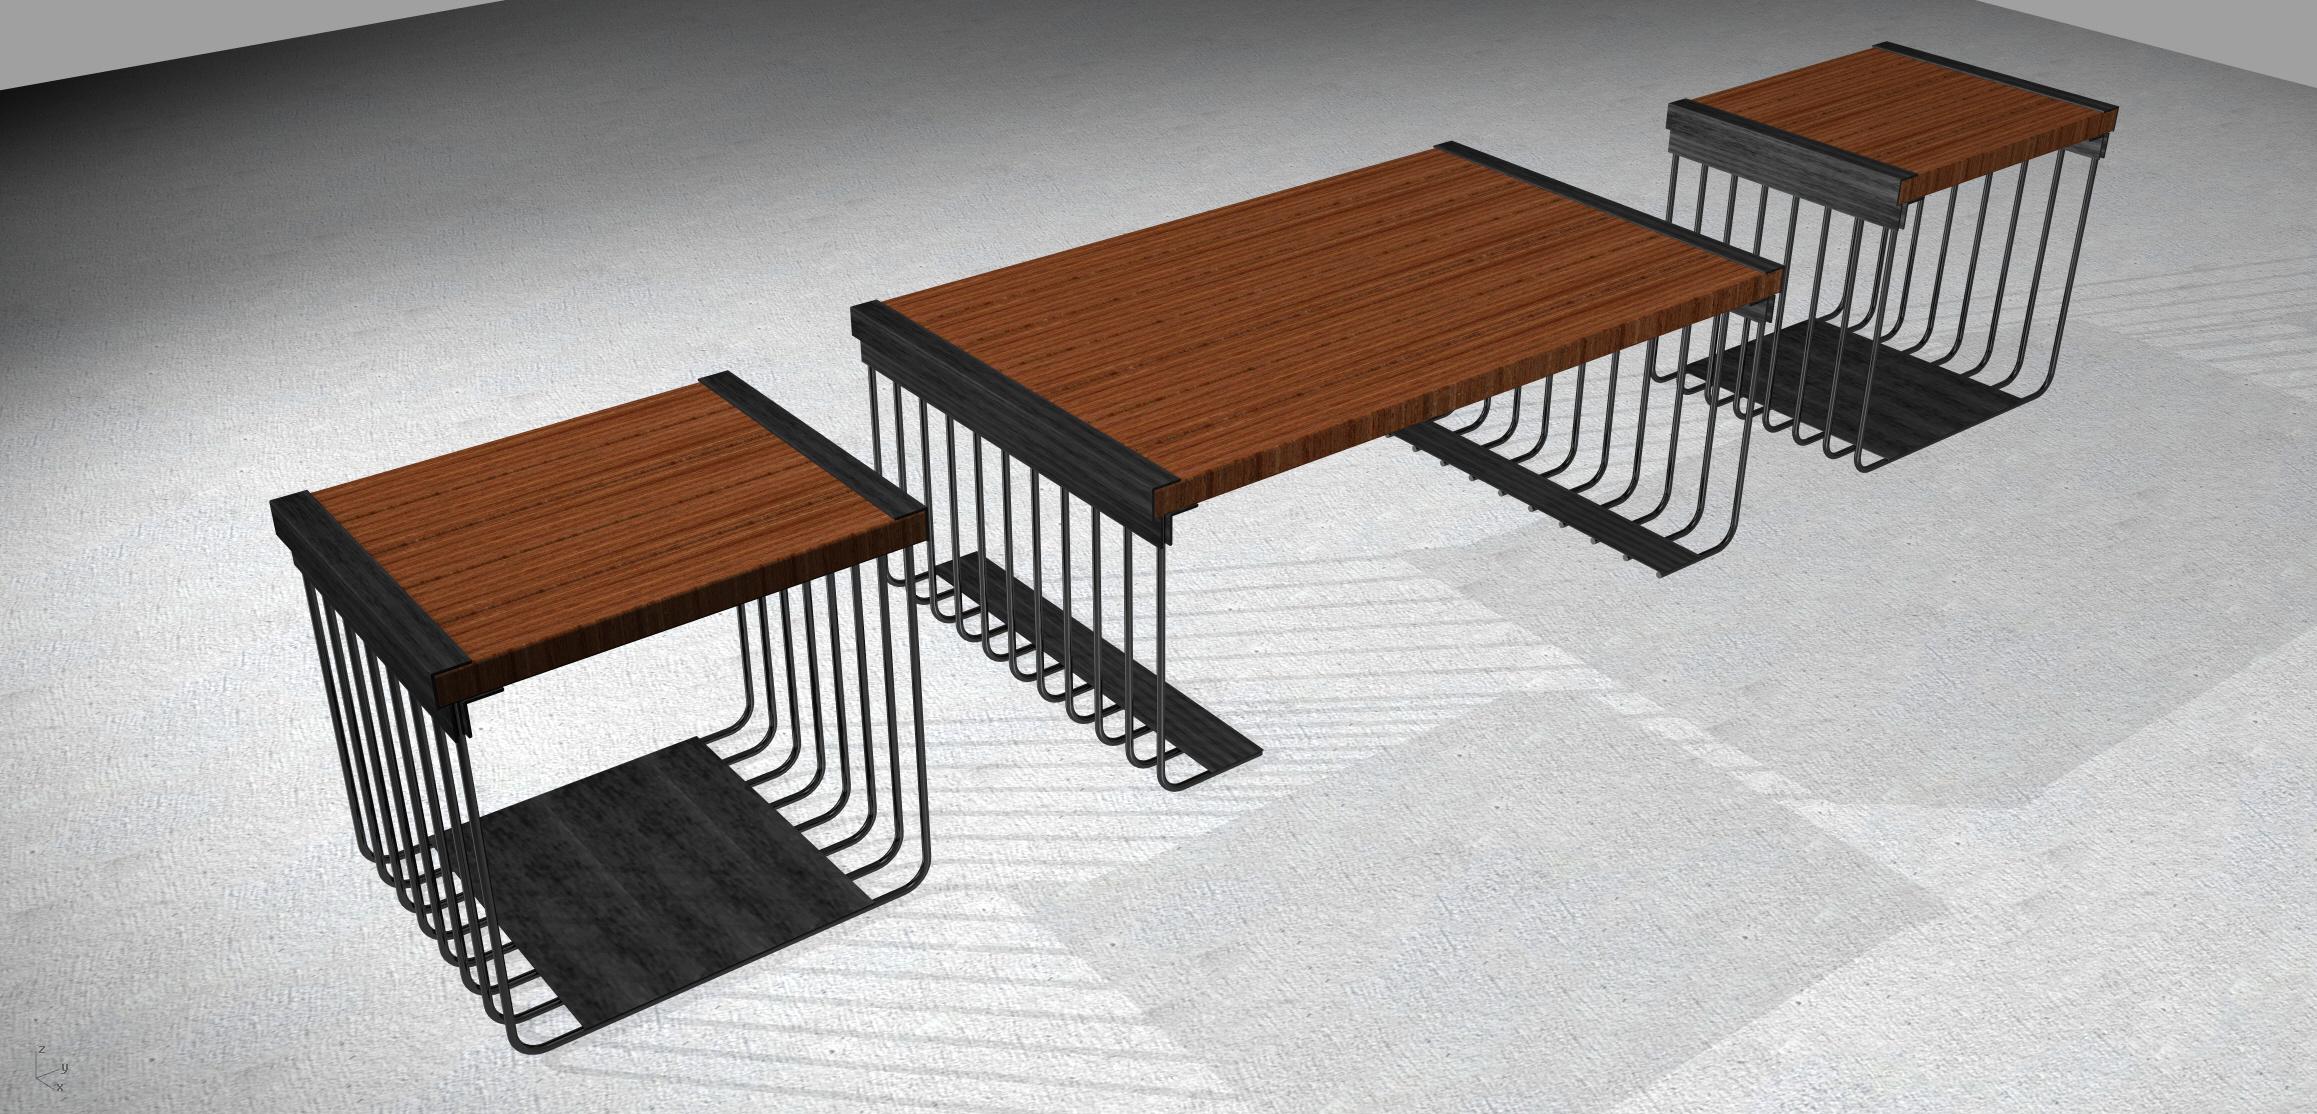 Tables-Final-01.jpg